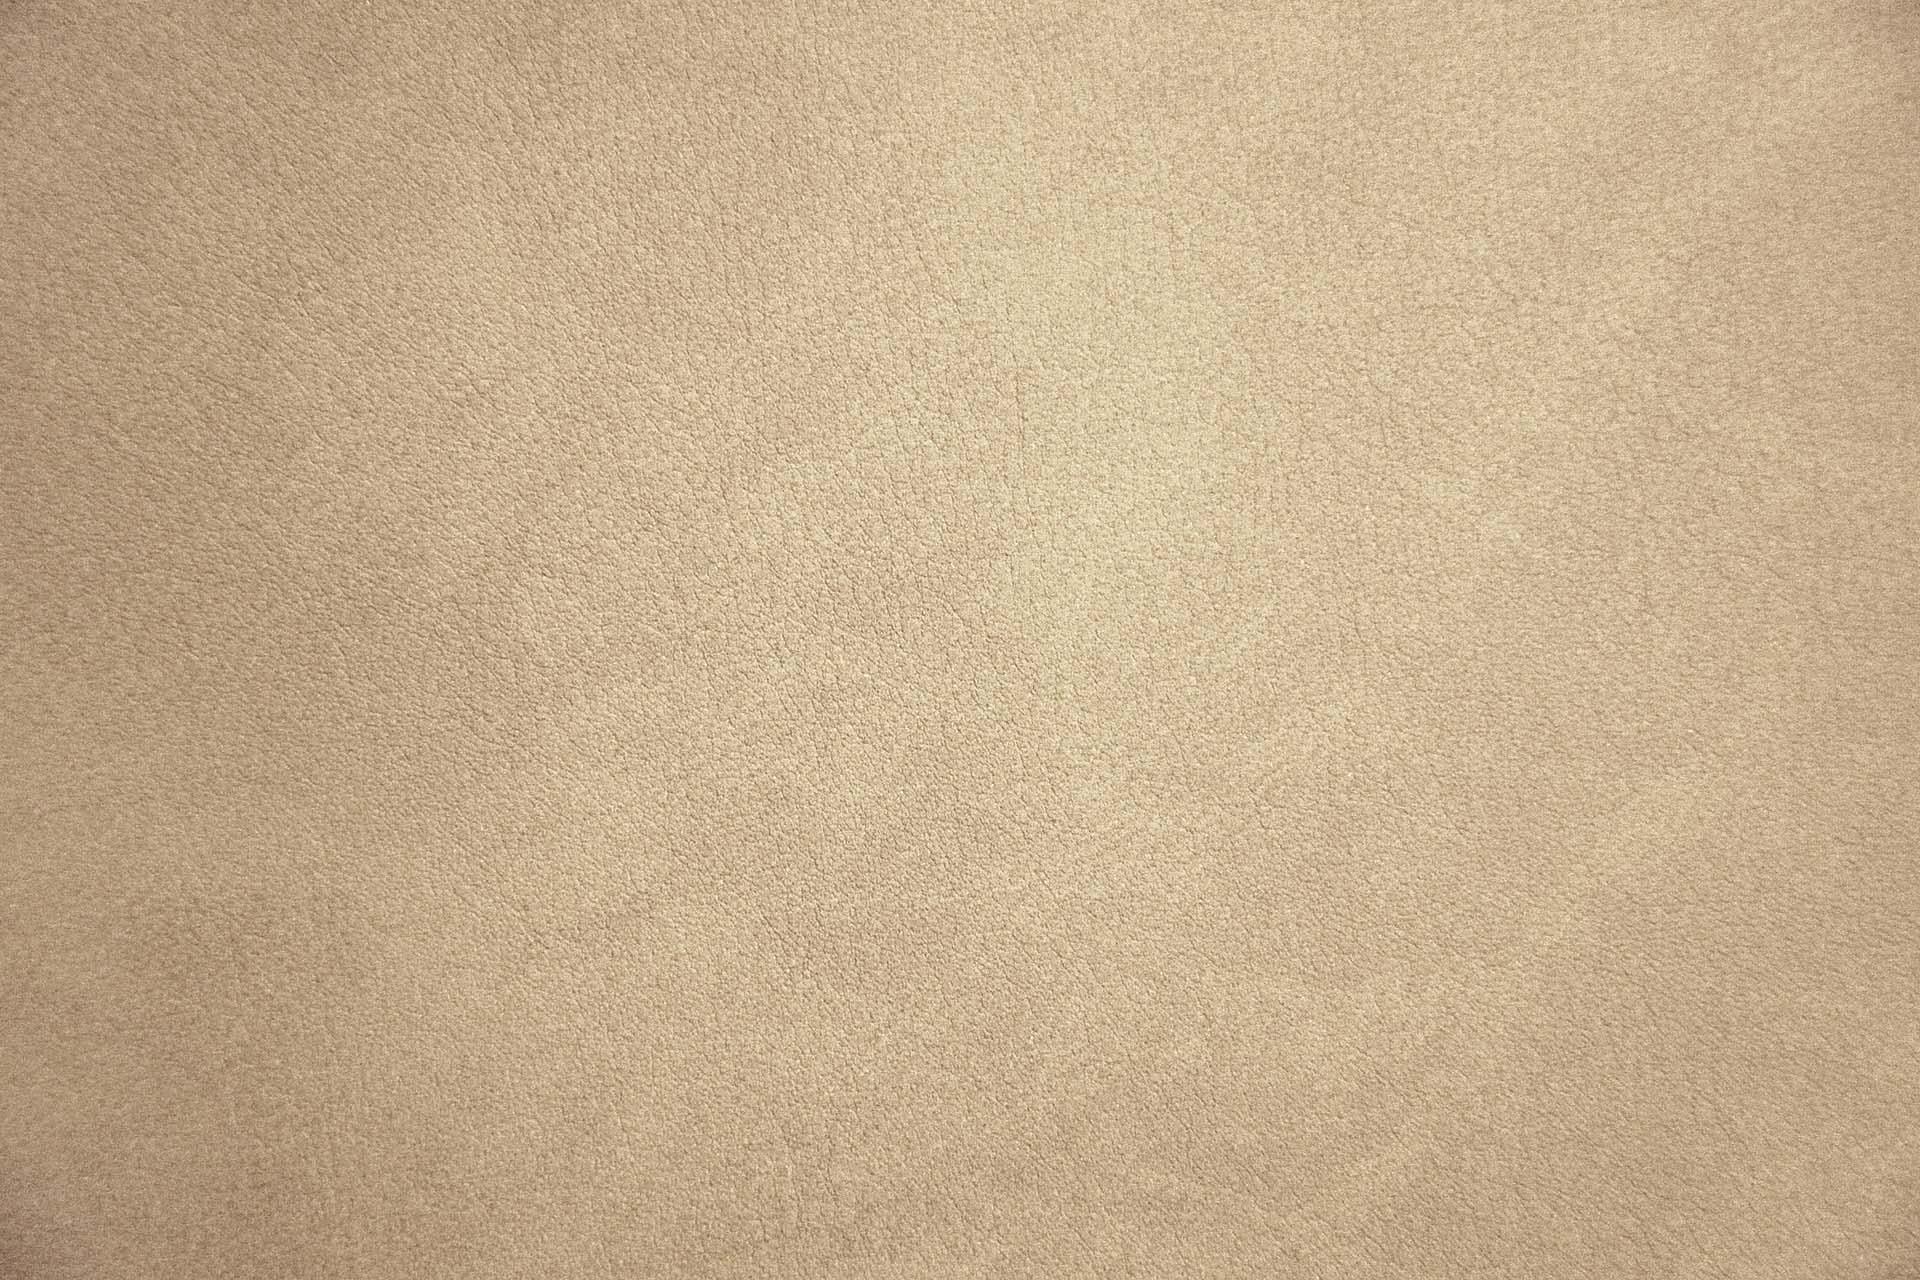 Palma tissu ameublement fauteuil imitation cuir - Tissu imitation cuir capitonne ...